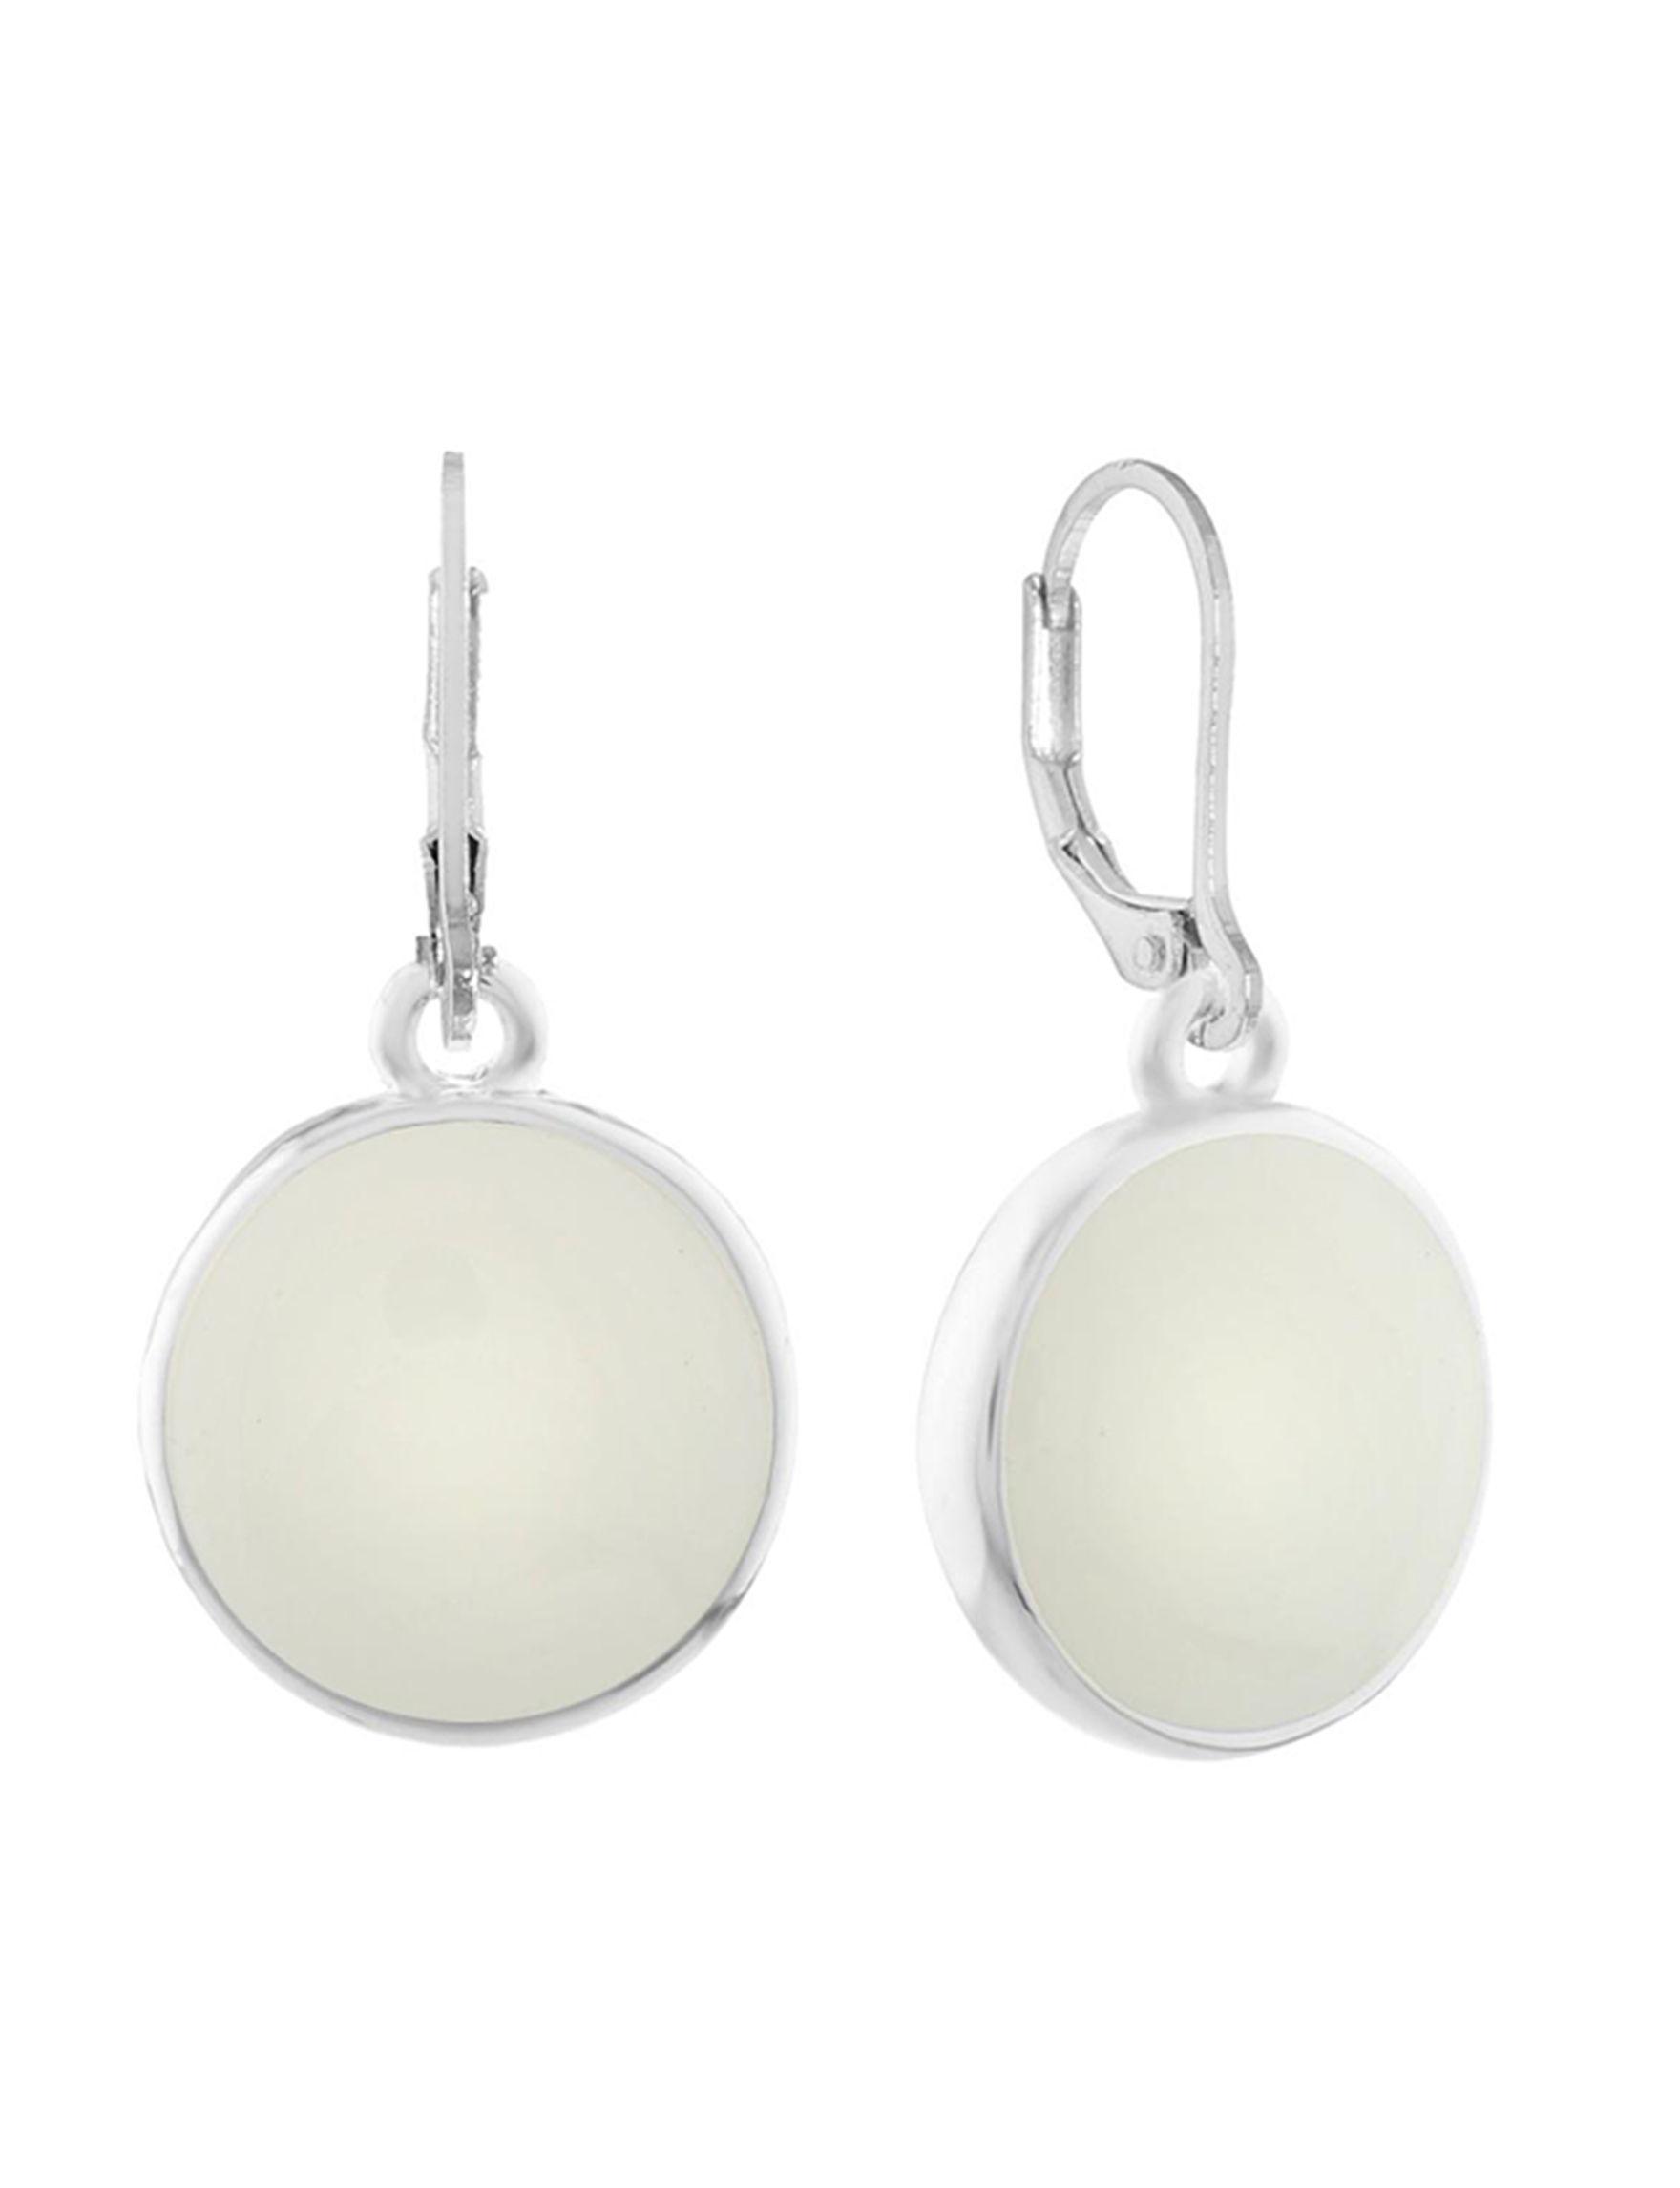 Gloria Vanderbilt Silver / White Drops Earrings Fashion Jewelry